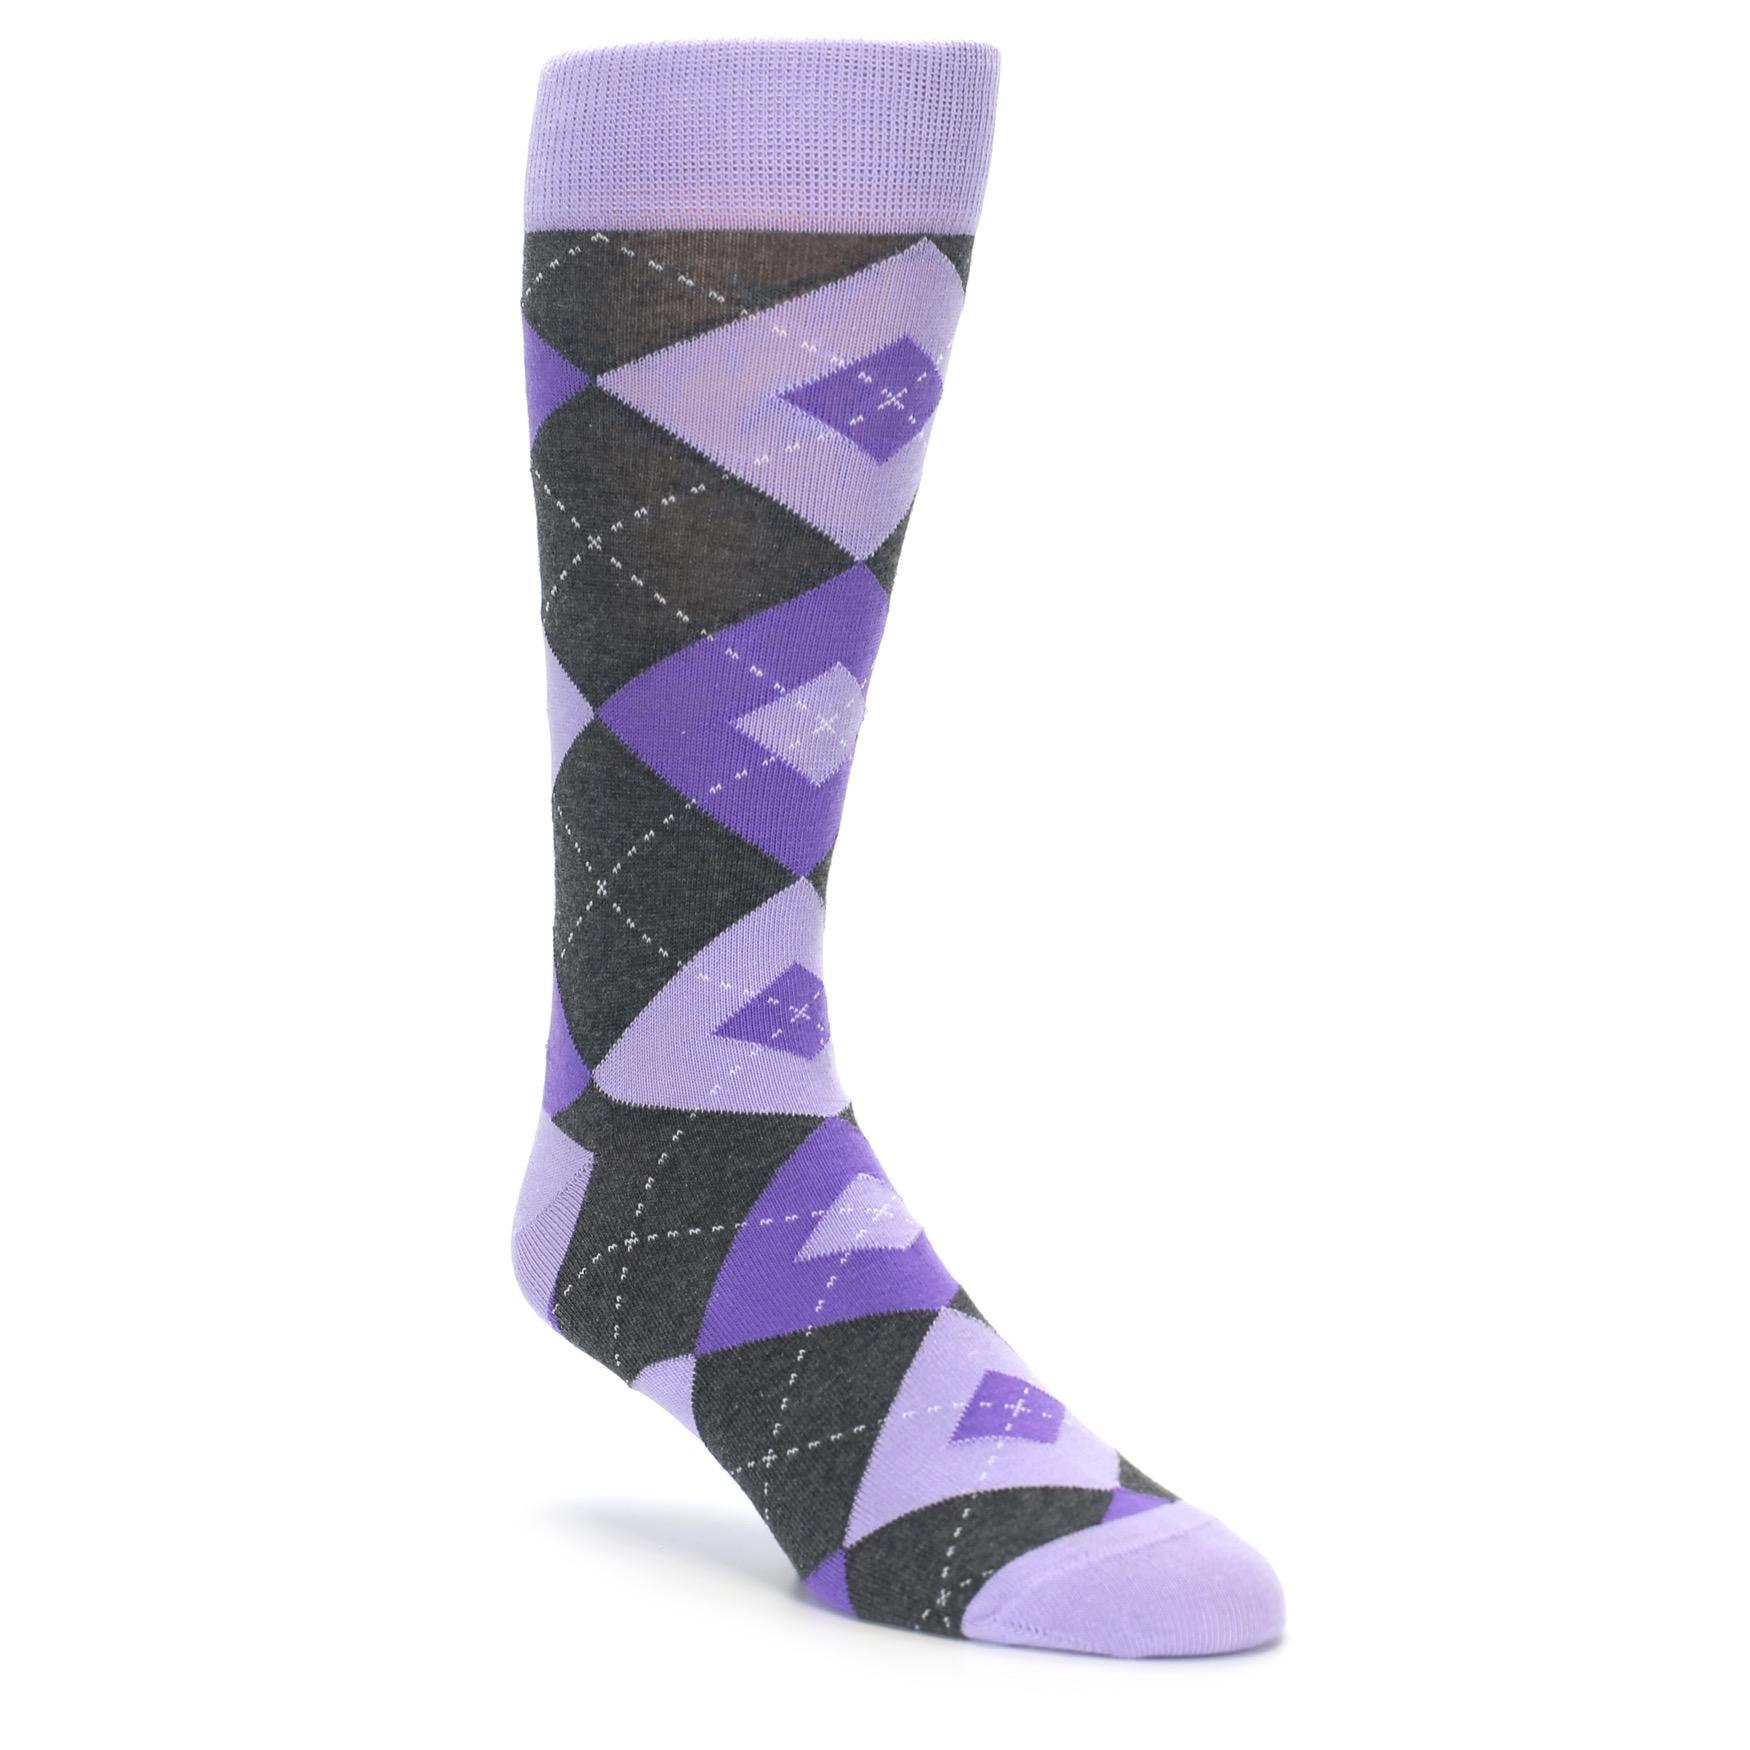 Lilac Iris Purple Argyle Wedding Socks For Groomsmen